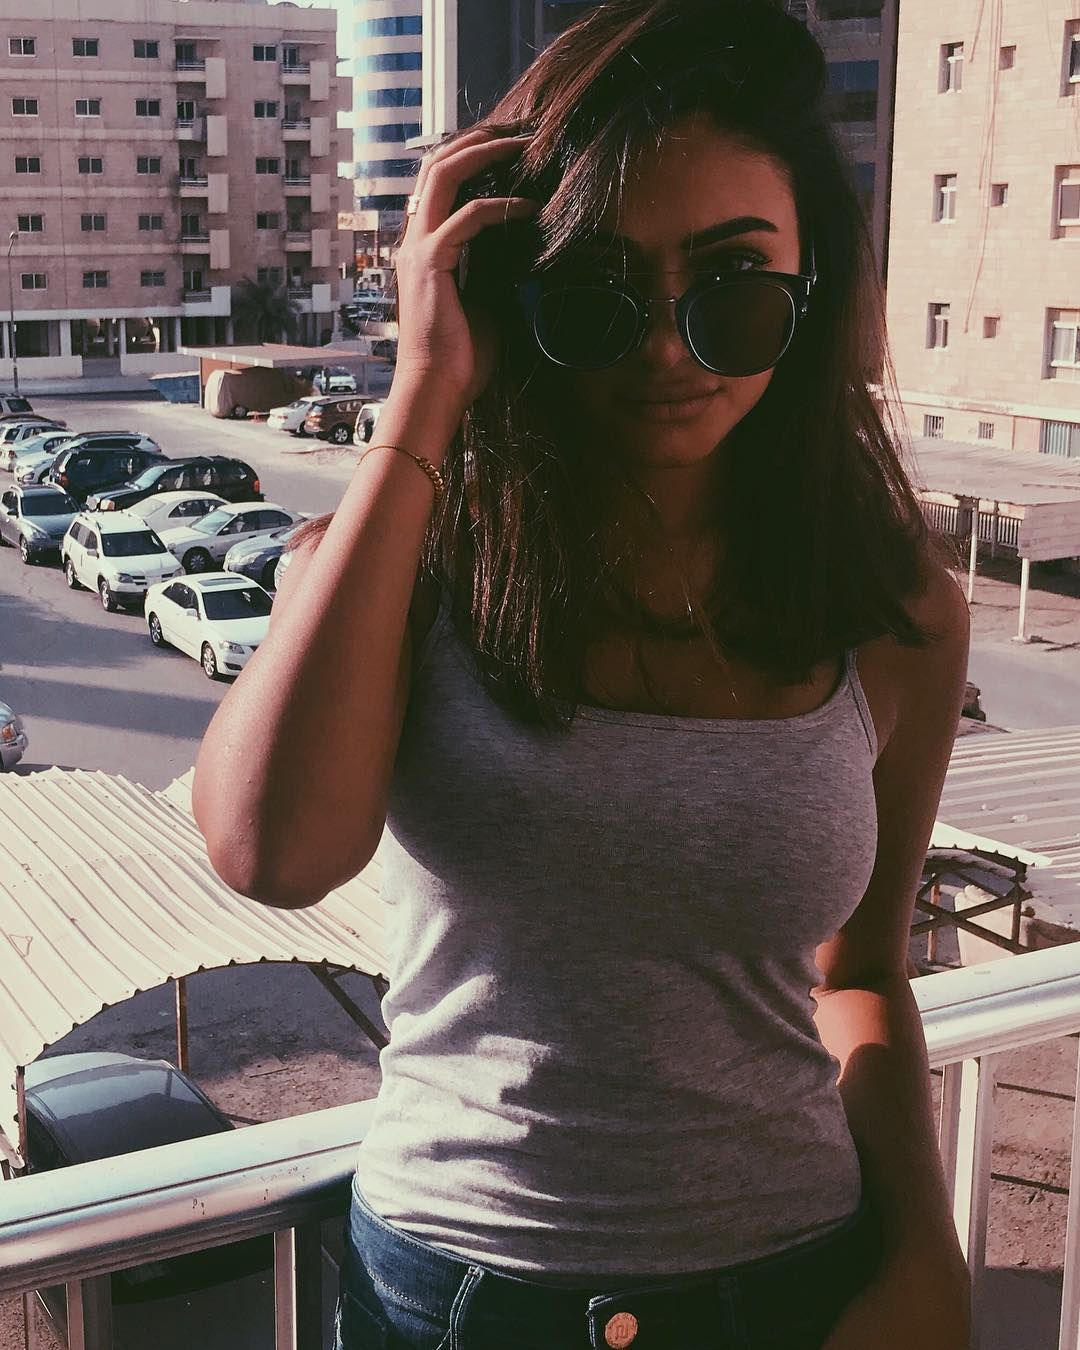 شوق الهادي On Instagram Hotter Than Your Ex Better Than Your Next Fashion T Shirts For Women Hot